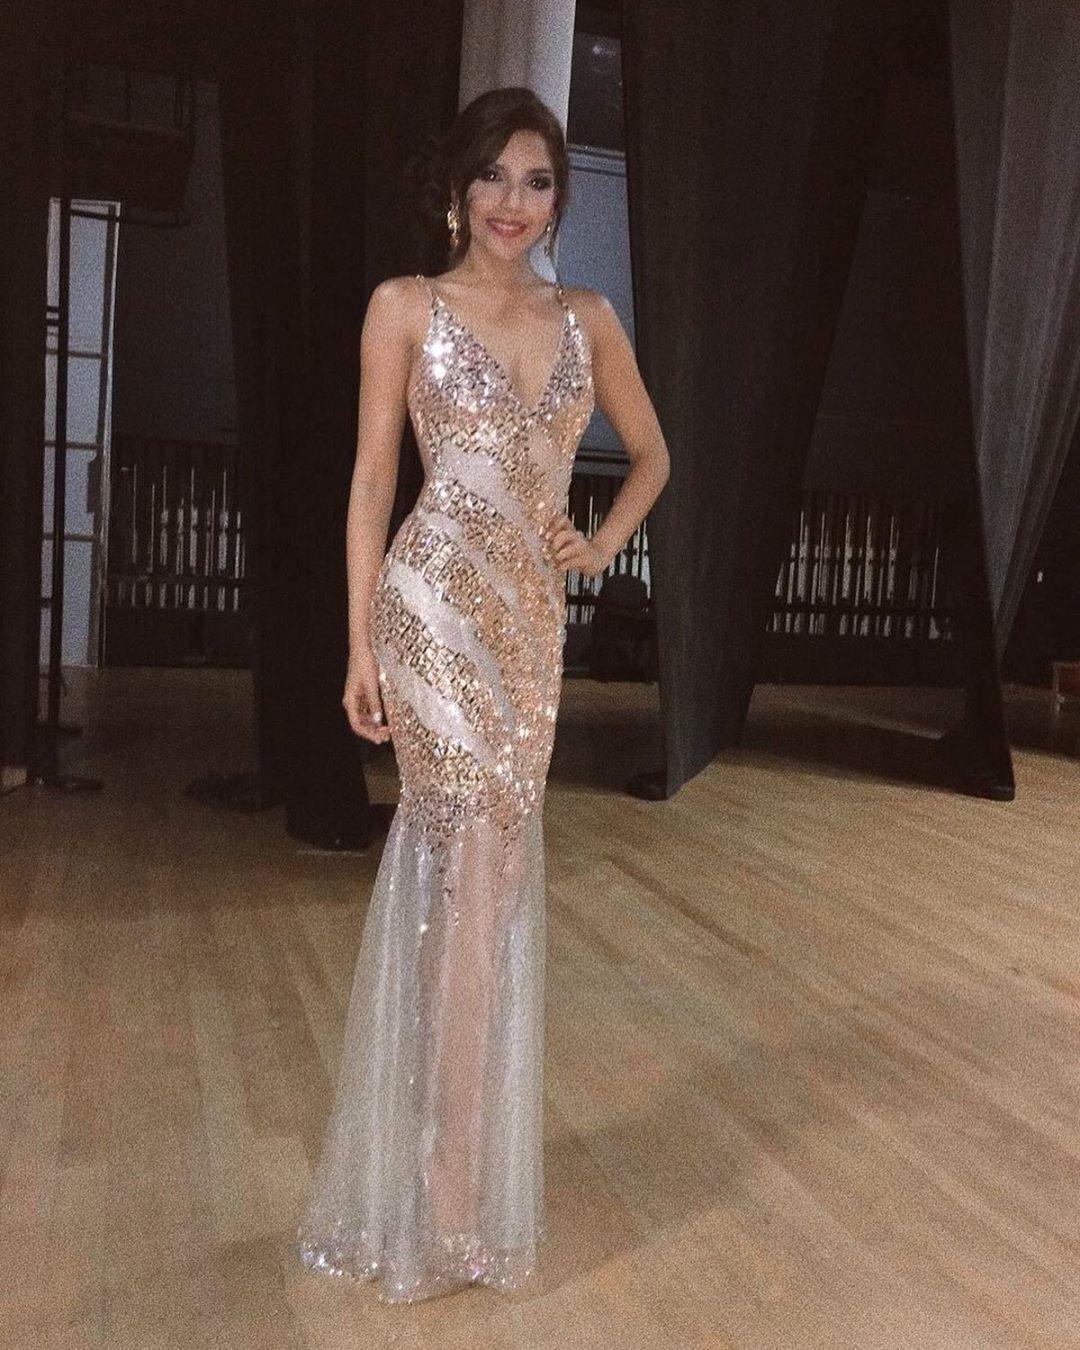 laura gonzalez, 1st runner-up de miss universe 2017. - Página 29 72951310